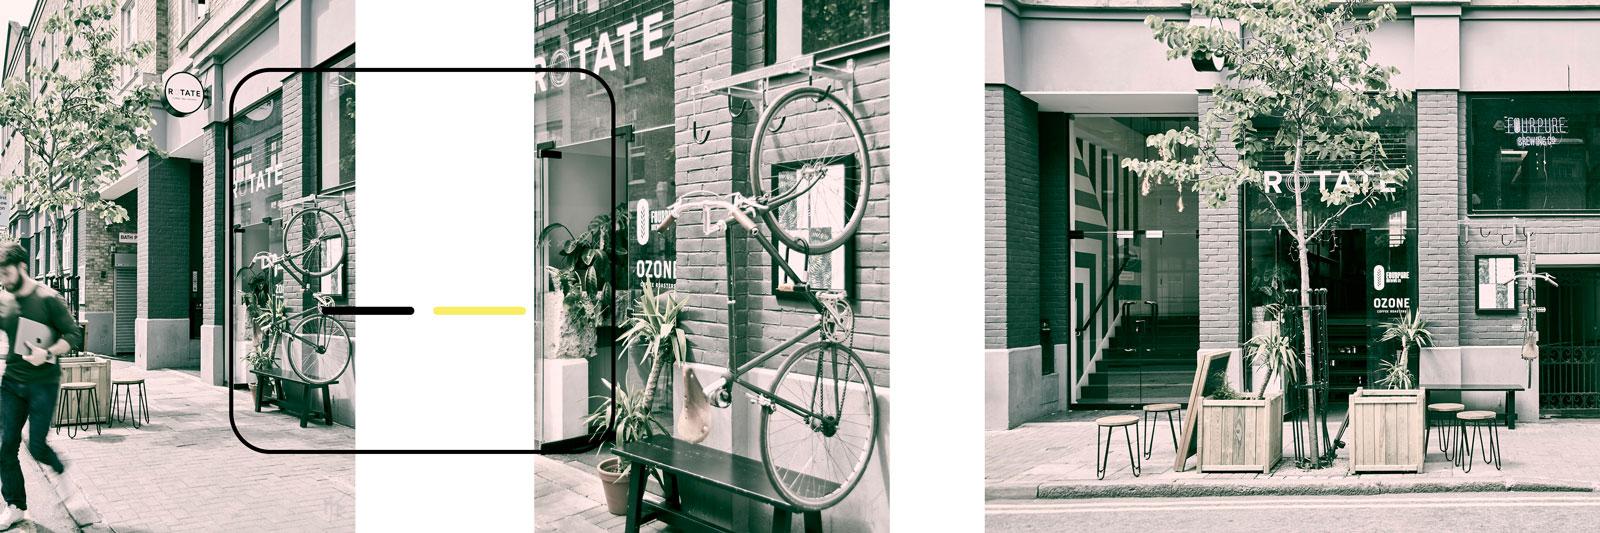 Rotate-Shoreditch-01-03_web.jpg